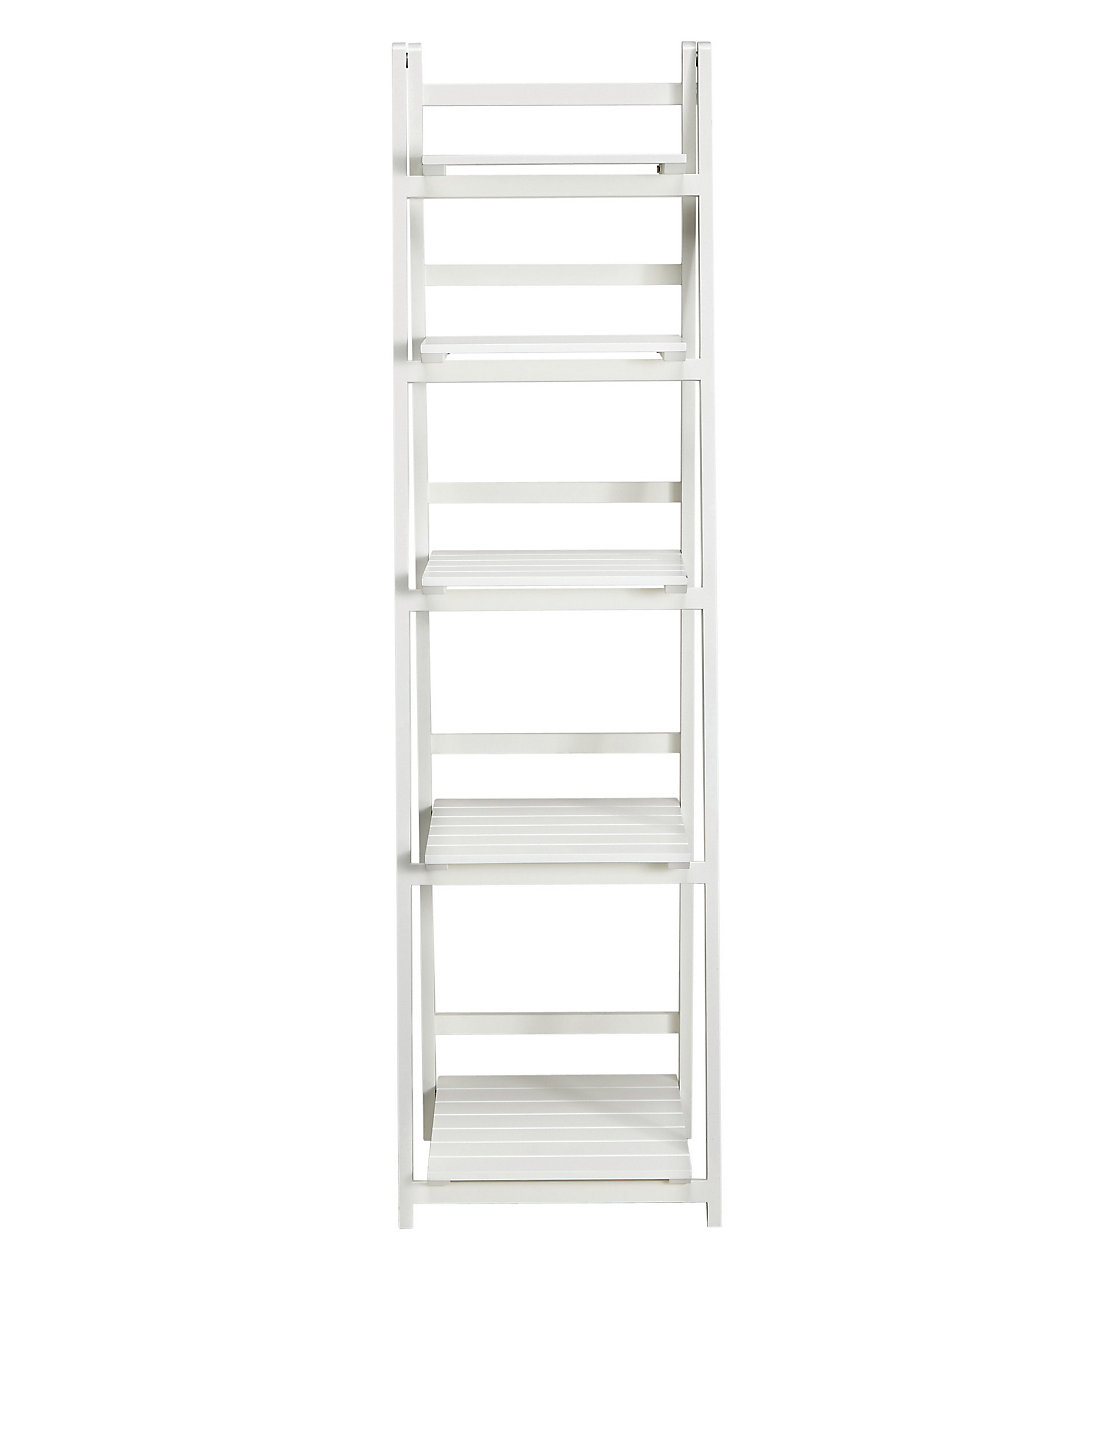 Bathroom storage units free standing - Nagoya Folding Shelving High White